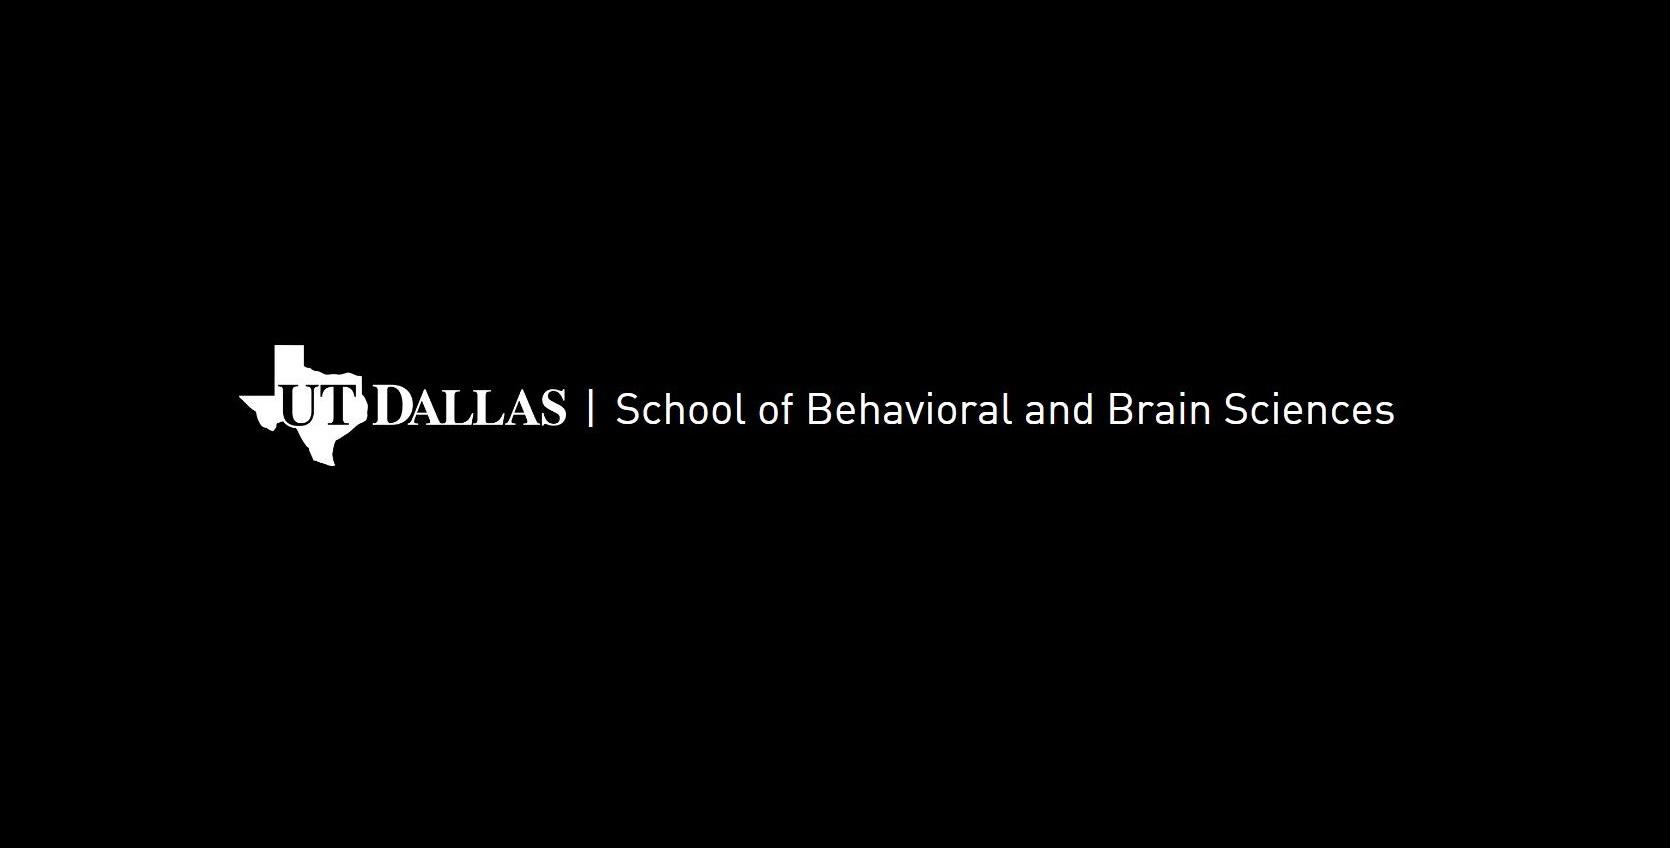 Cognition & Neuroscience PhD Program | University of Texas